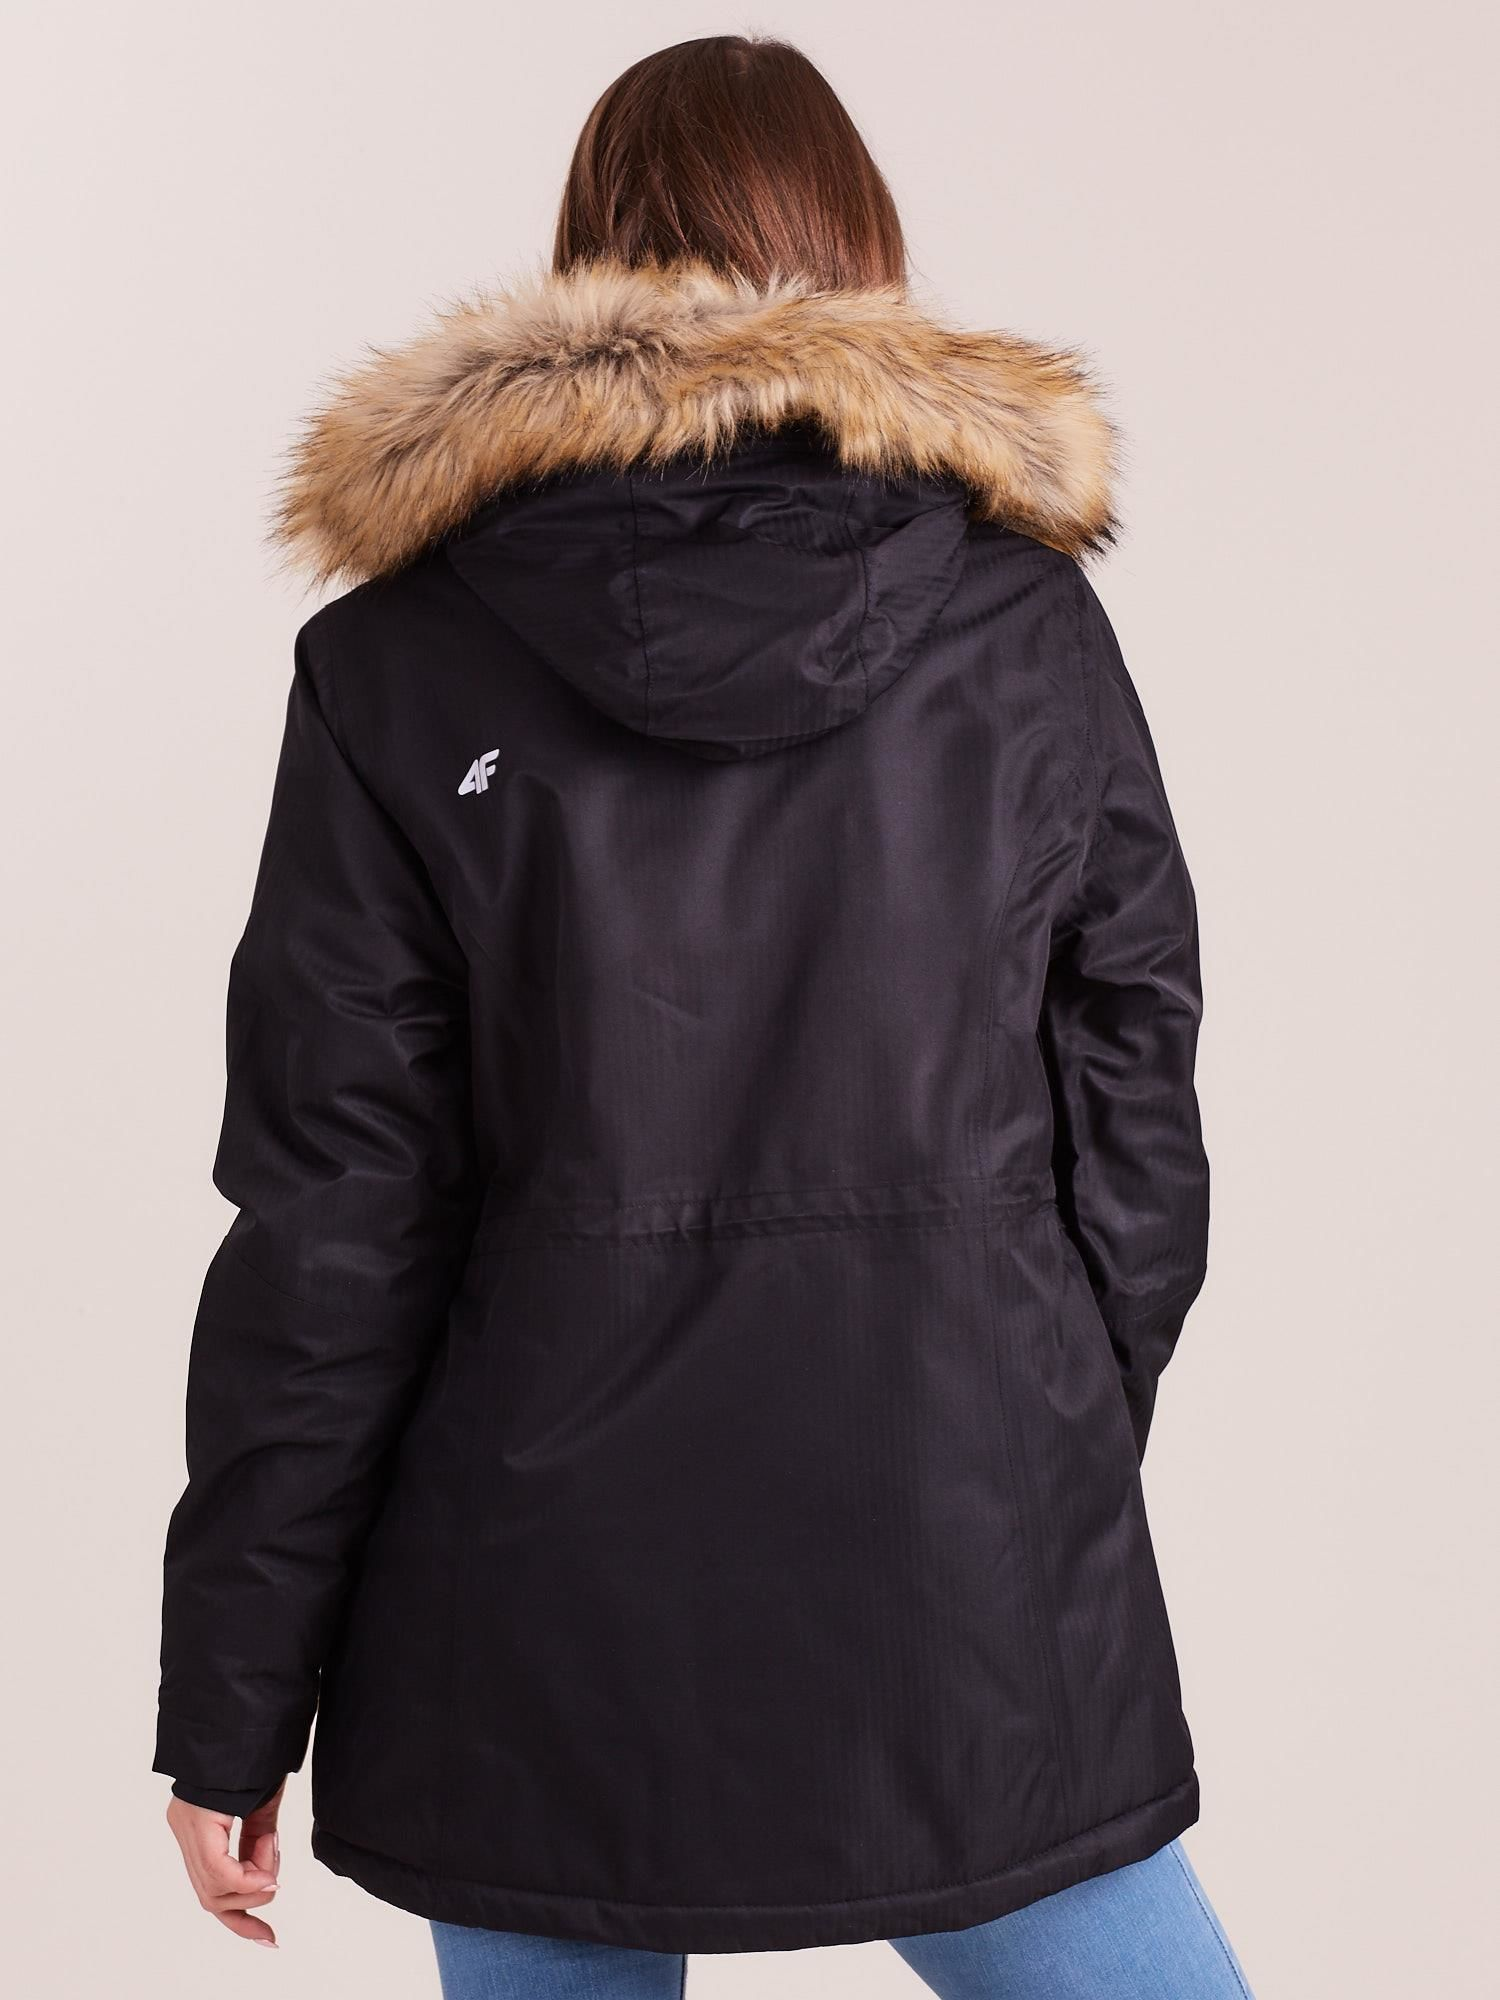 38b5c8e43 4F Czarna kurtka narciarska z kapturem i futerkiem - Kurtka zimowa ...